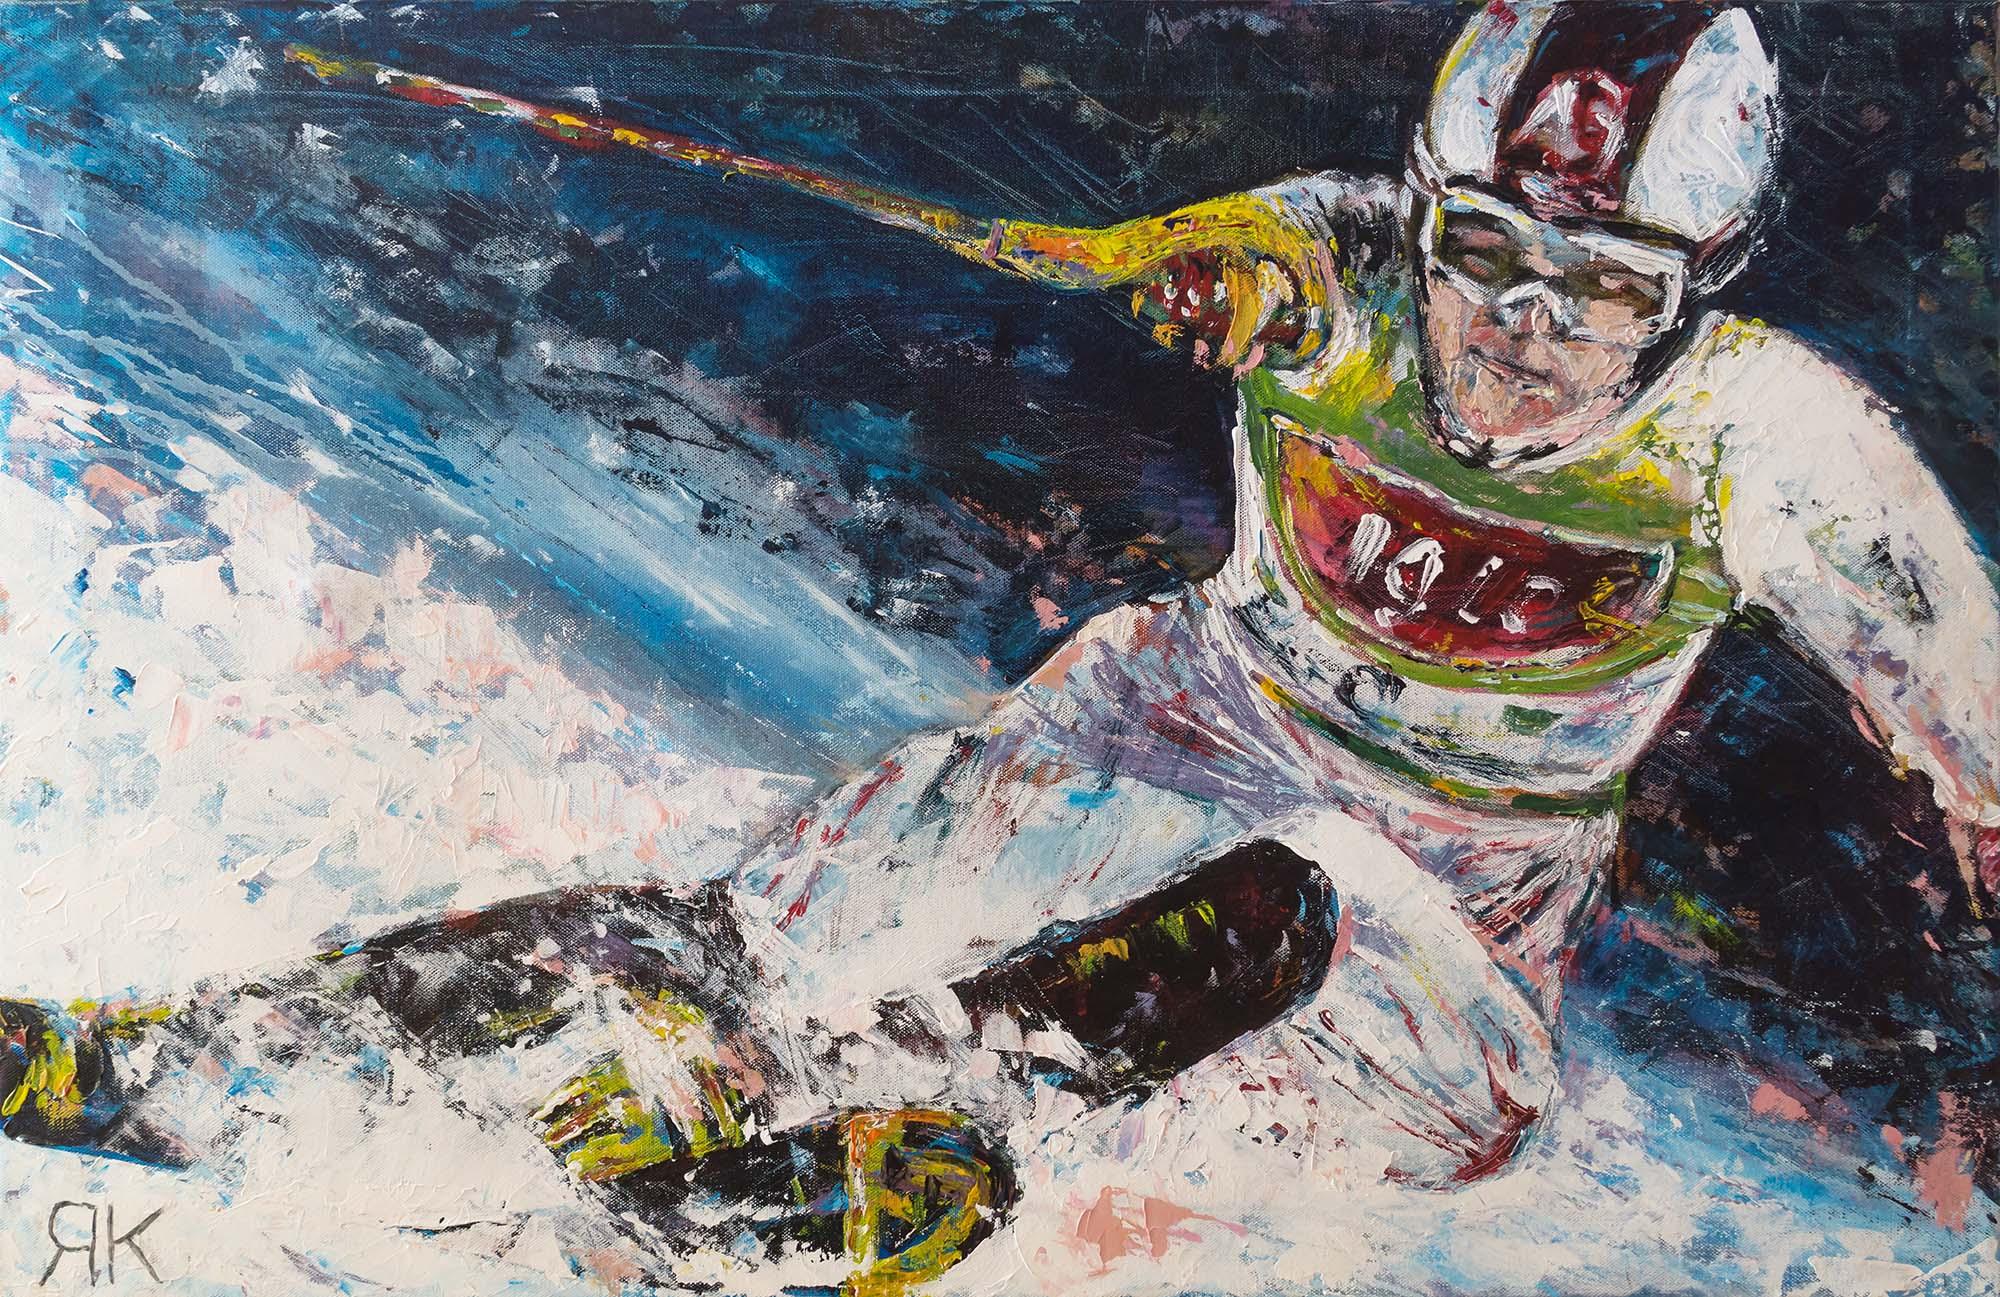 Skiing man at a race by Ria Kieboom